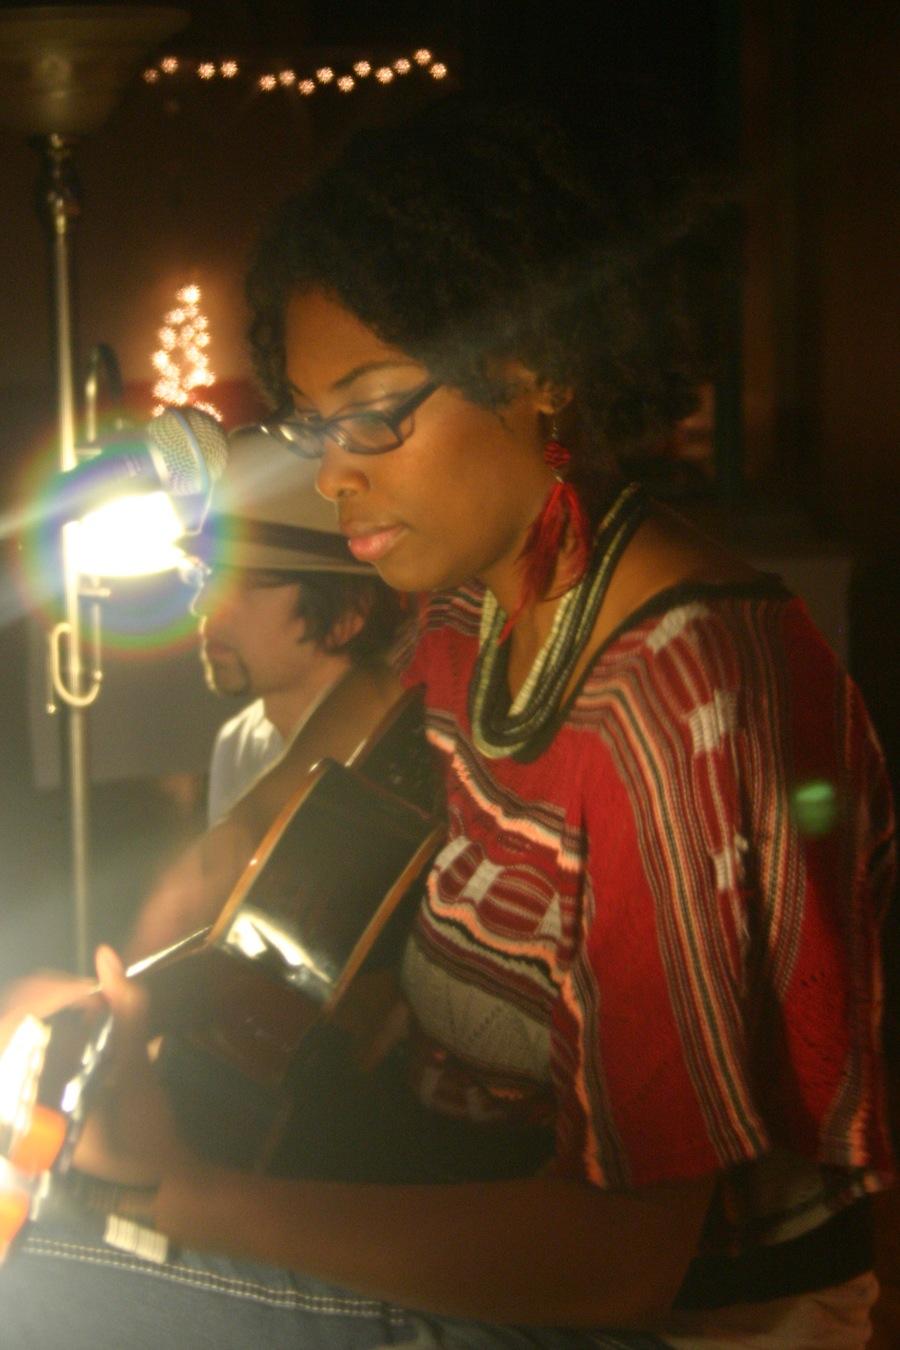 Anitra Jay performing at a Listening Party in Lynchburg, VA.